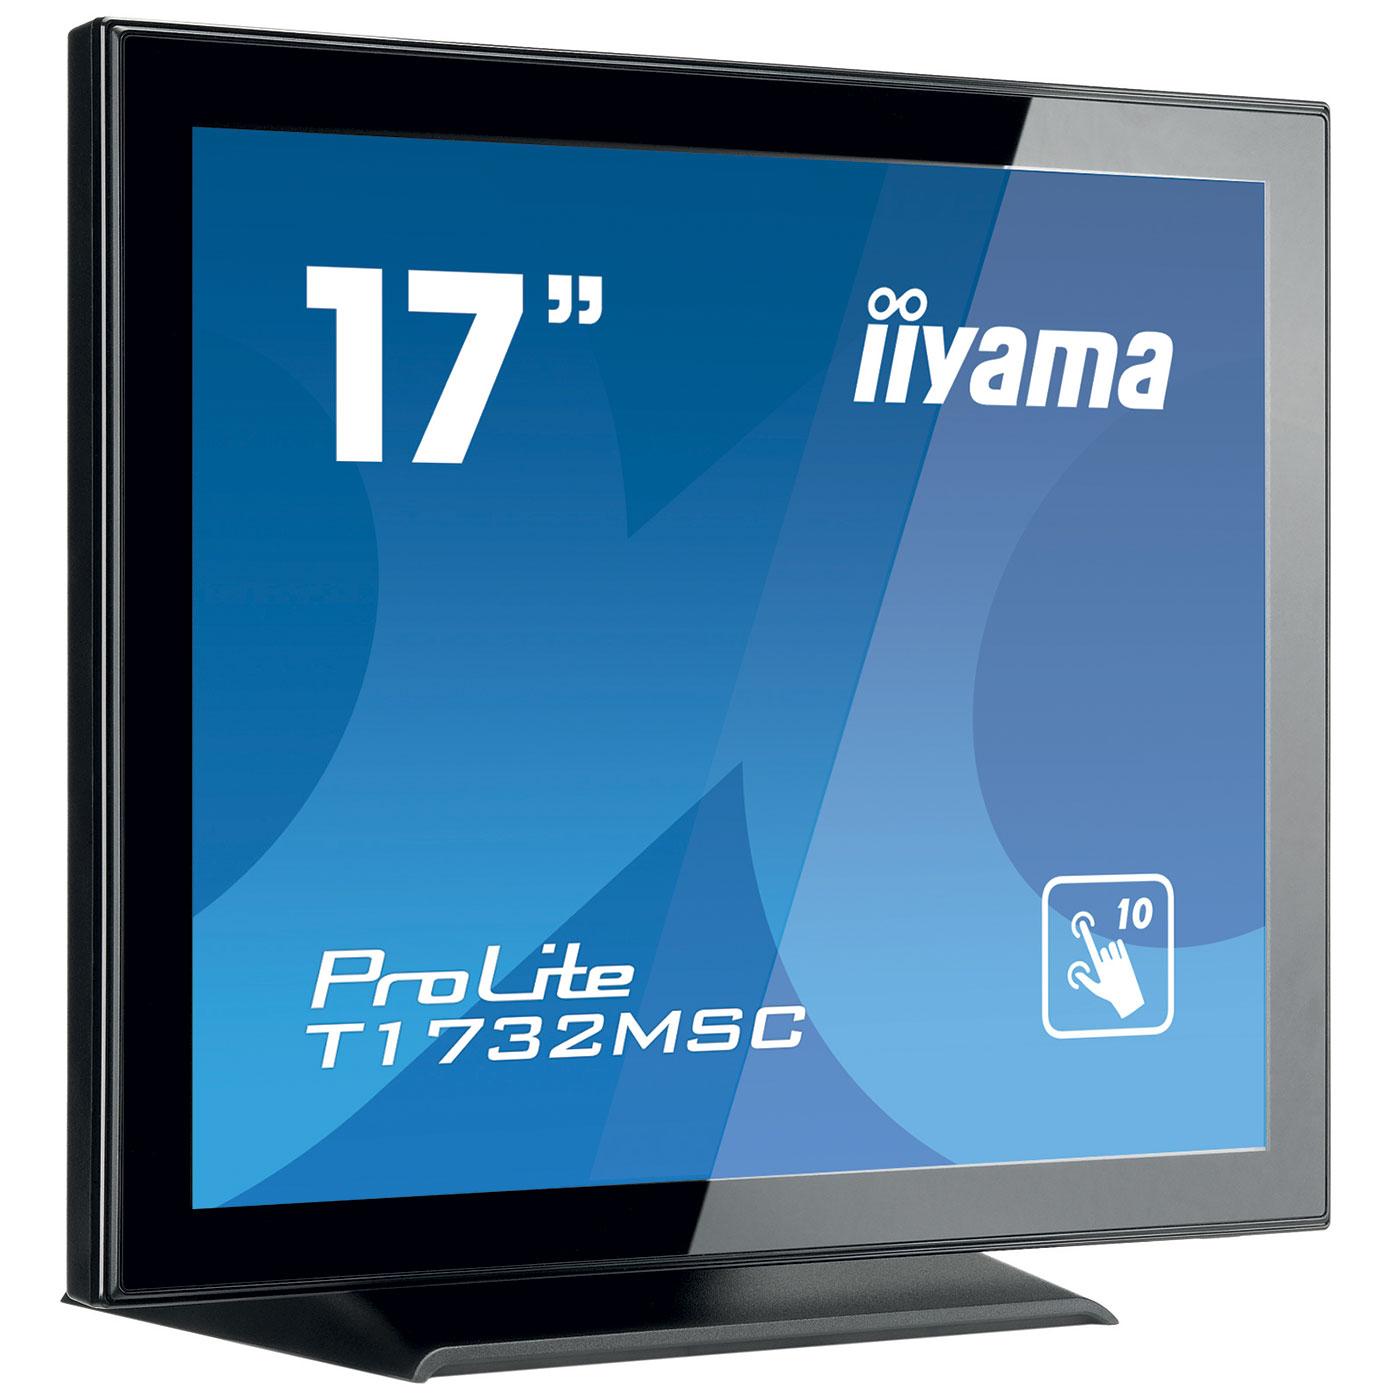 iiyama 17 lcd tactile prolite t1732msc b1x ecran pc. Black Bedroom Furniture Sets. Home Design Ideas